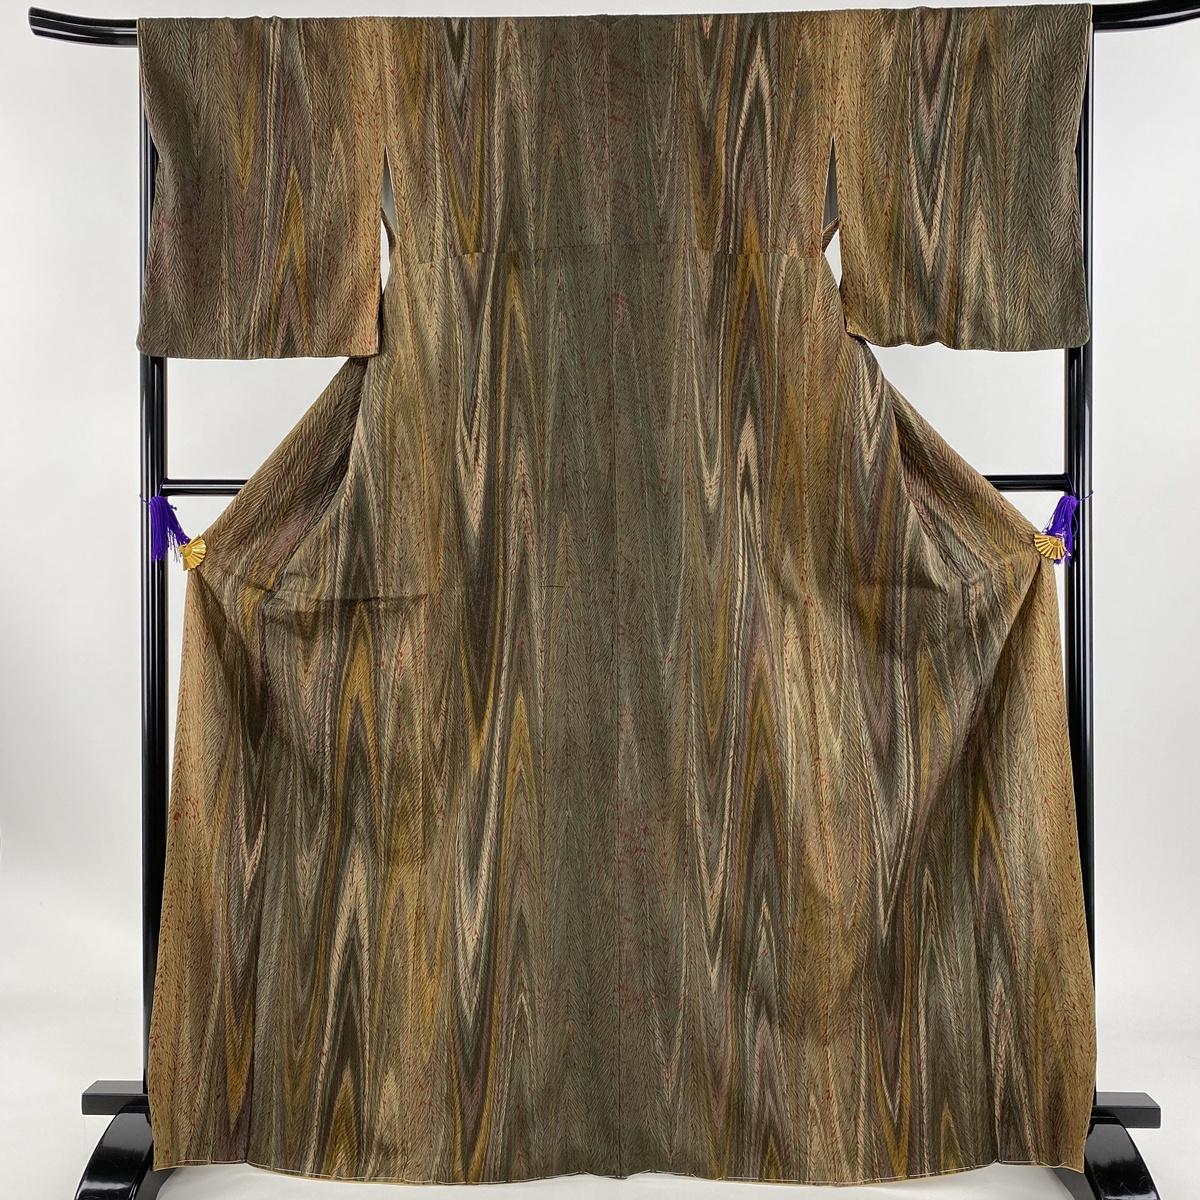 小紋 美品 名品 木目柄 縫い締め絞り 茶緑色 袷 身丈169.5cm 裄丈67cm M 正絹 【中古】